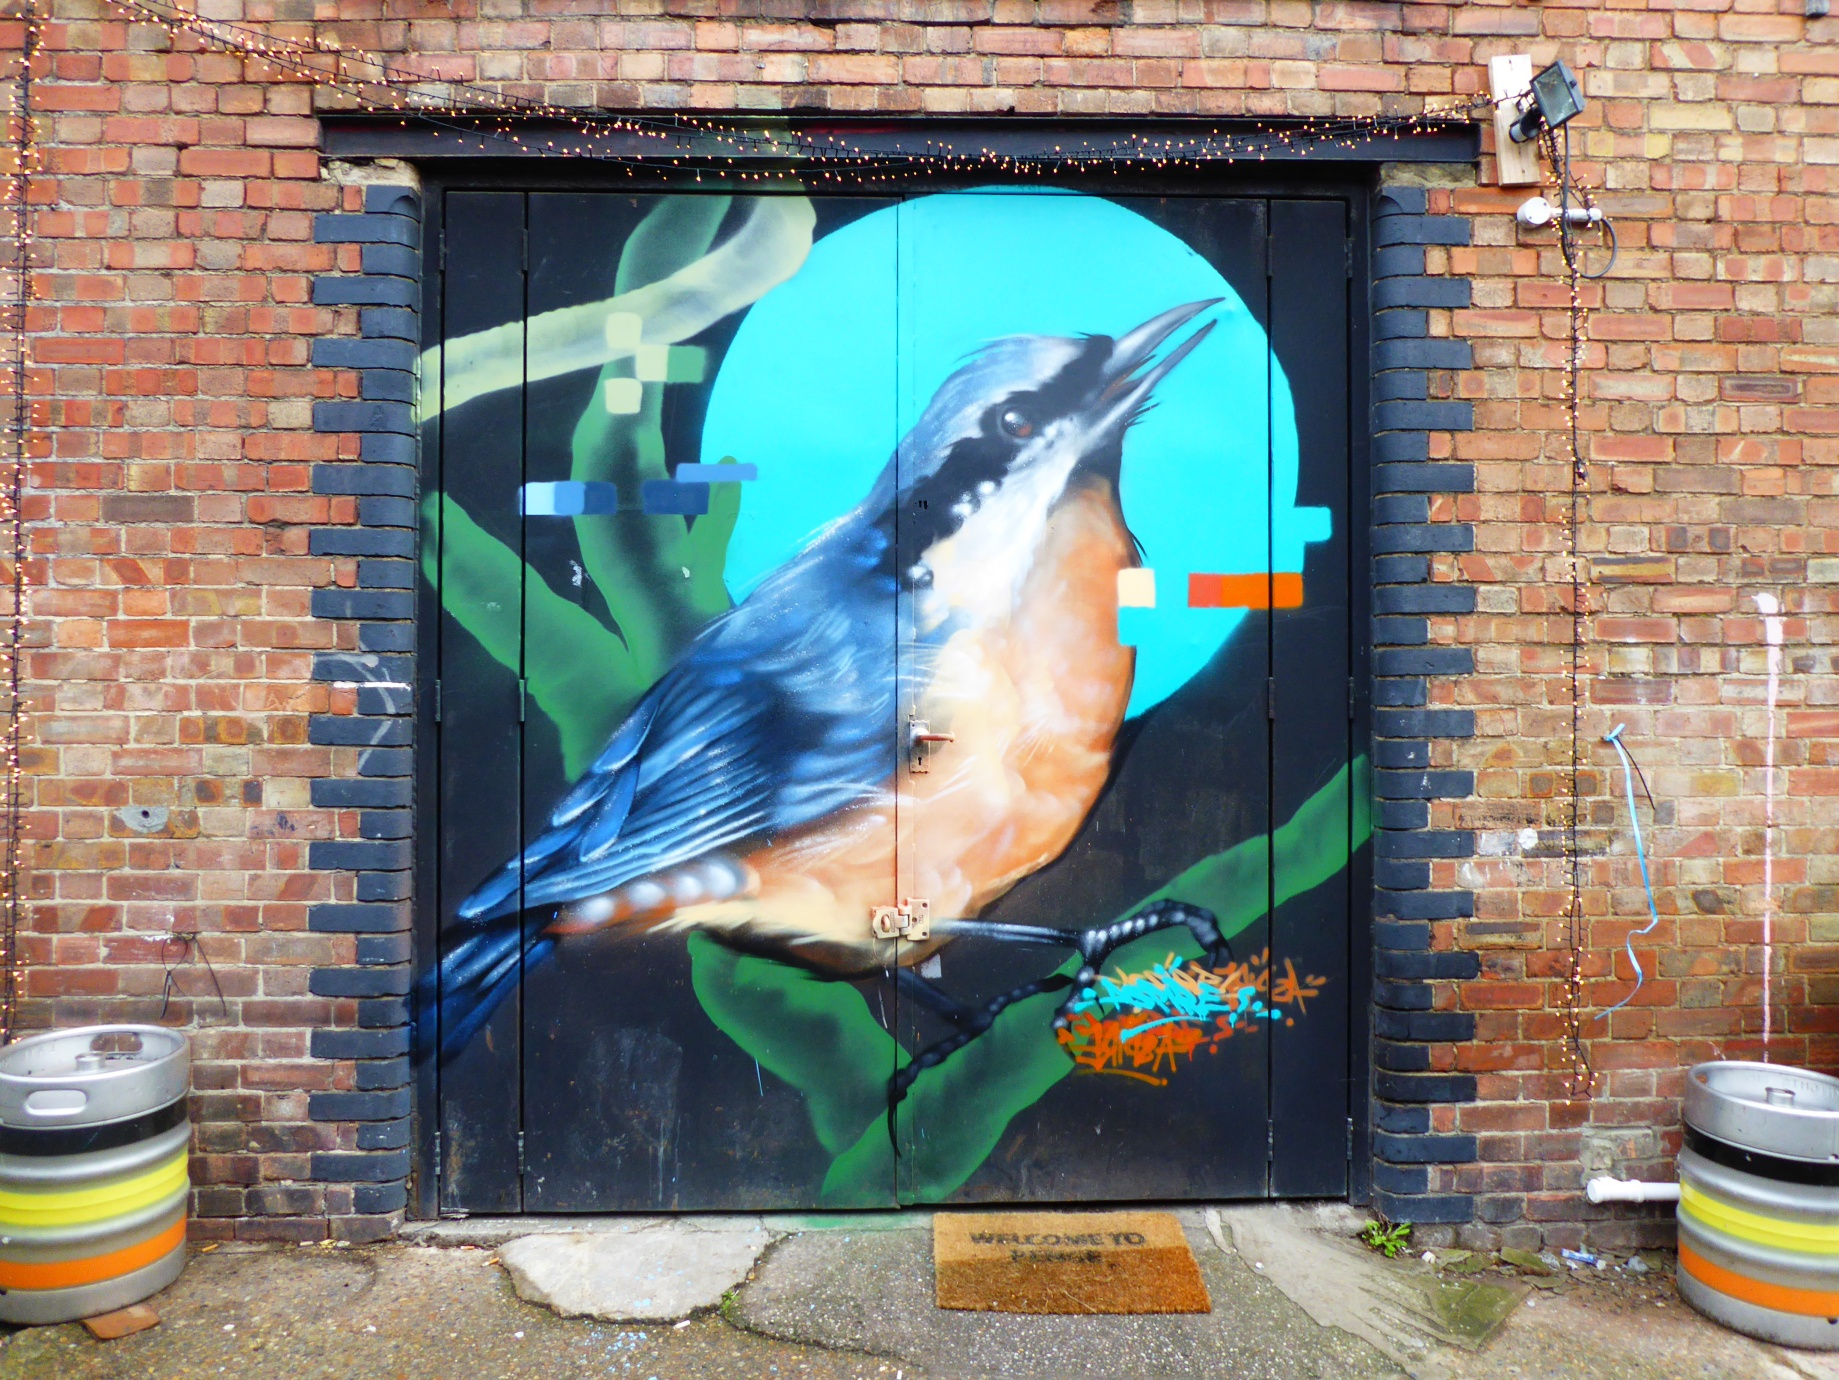 New aspire street art around south london 2018